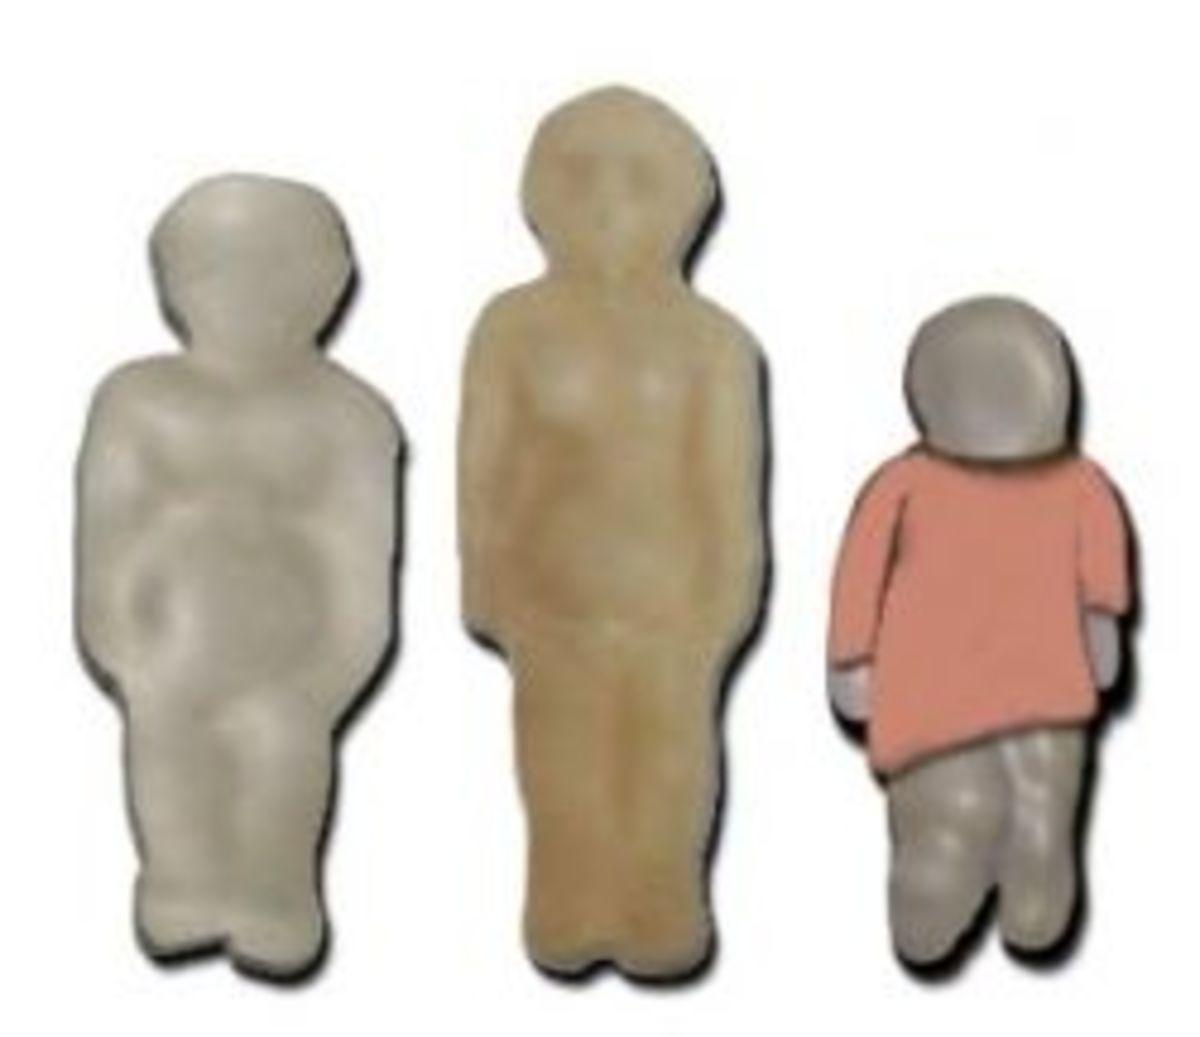 Wax Voodoo dolls. Photo copyright 2008 Denise Alvarado, All rights reserved worldwide.